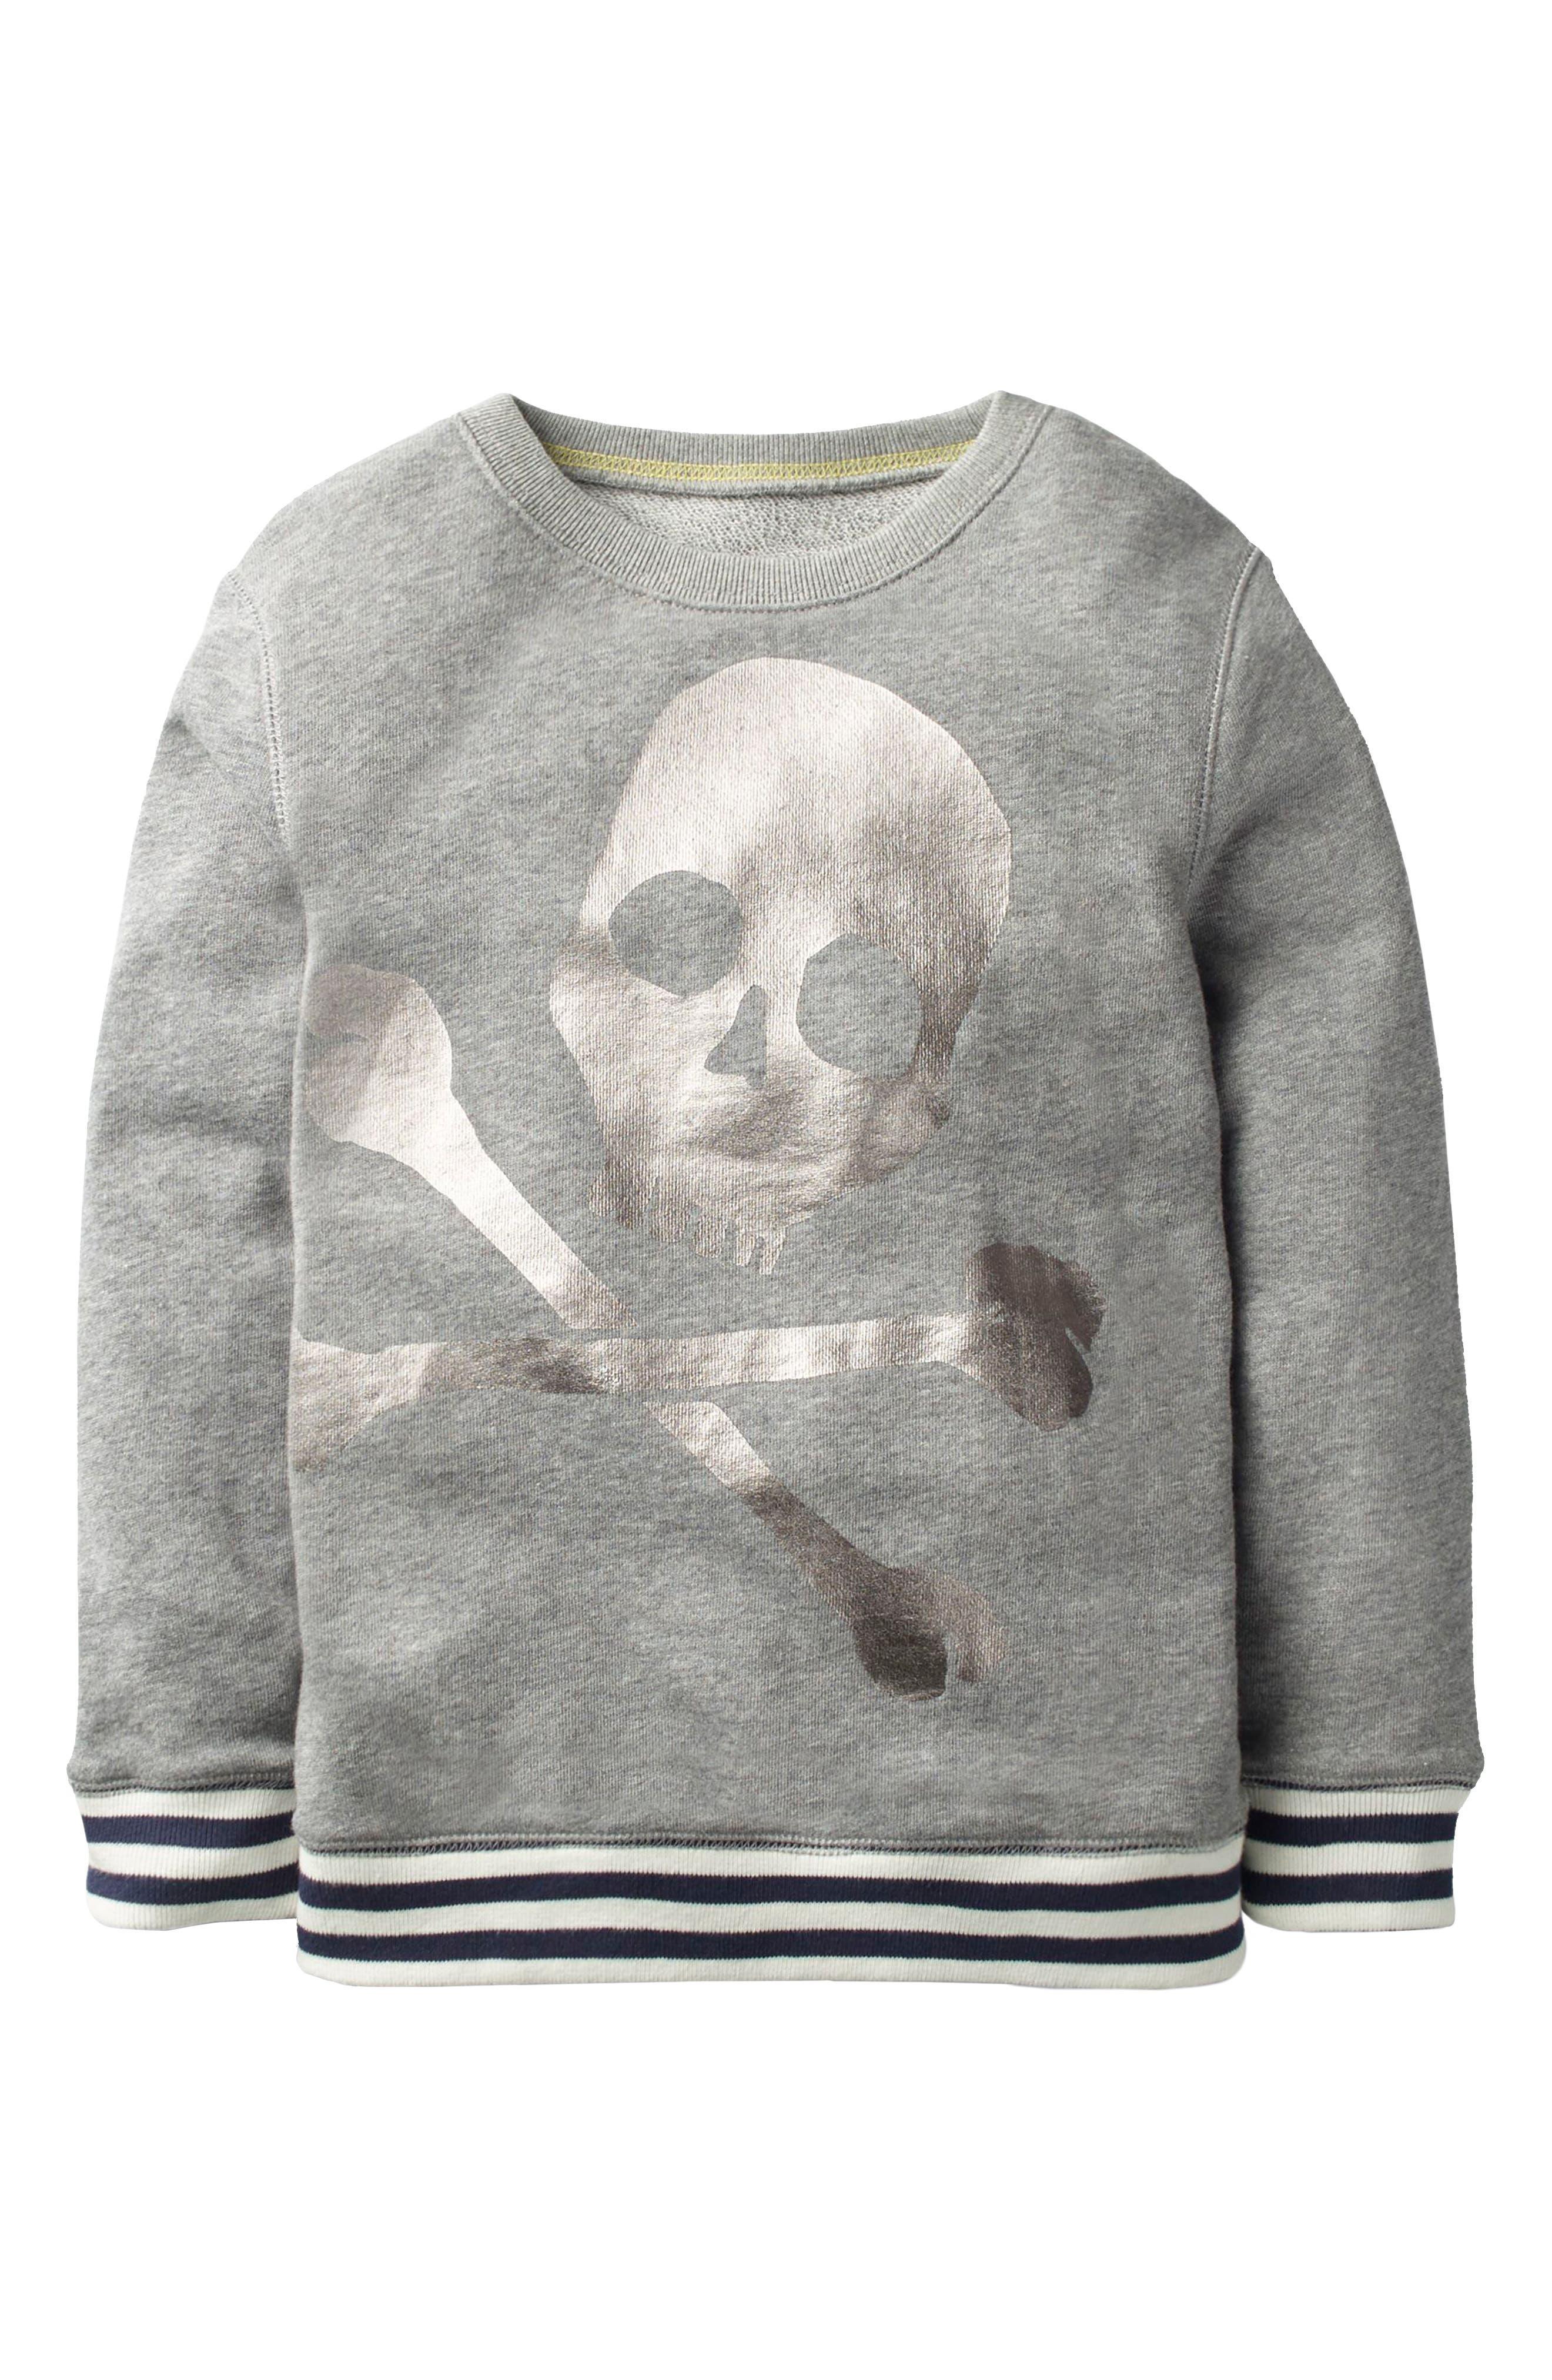 Mini Boden Fun Skull Sweatshirt (Toddler Boys, Little Boys & Big Boys)